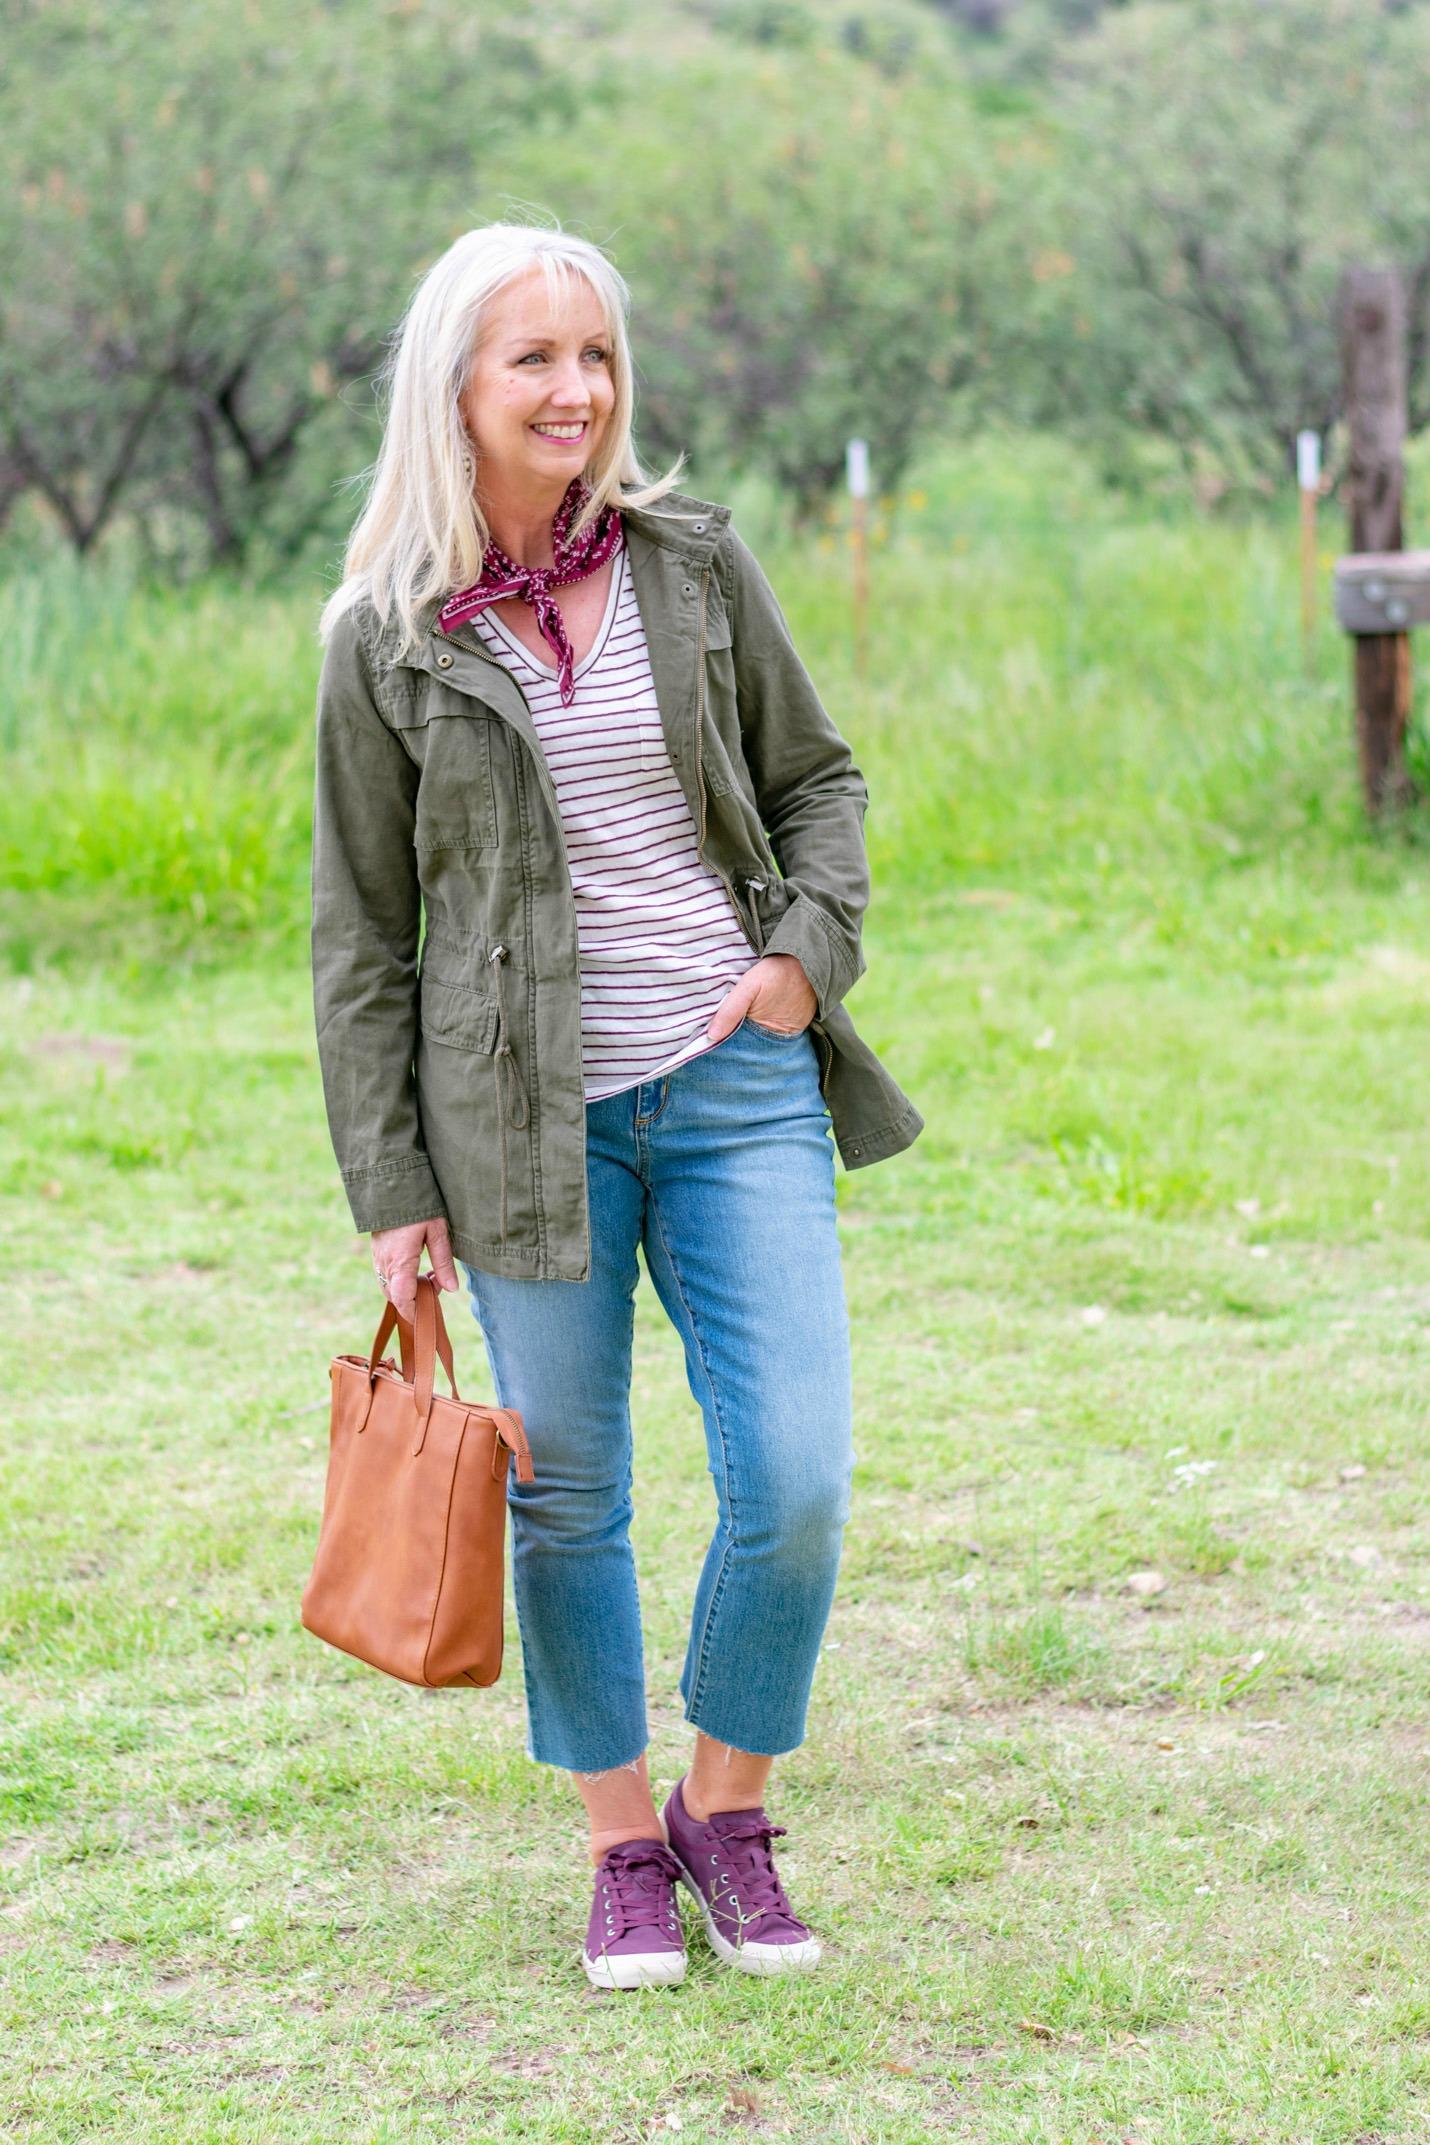 Utility Jacket for Leaf Peeping